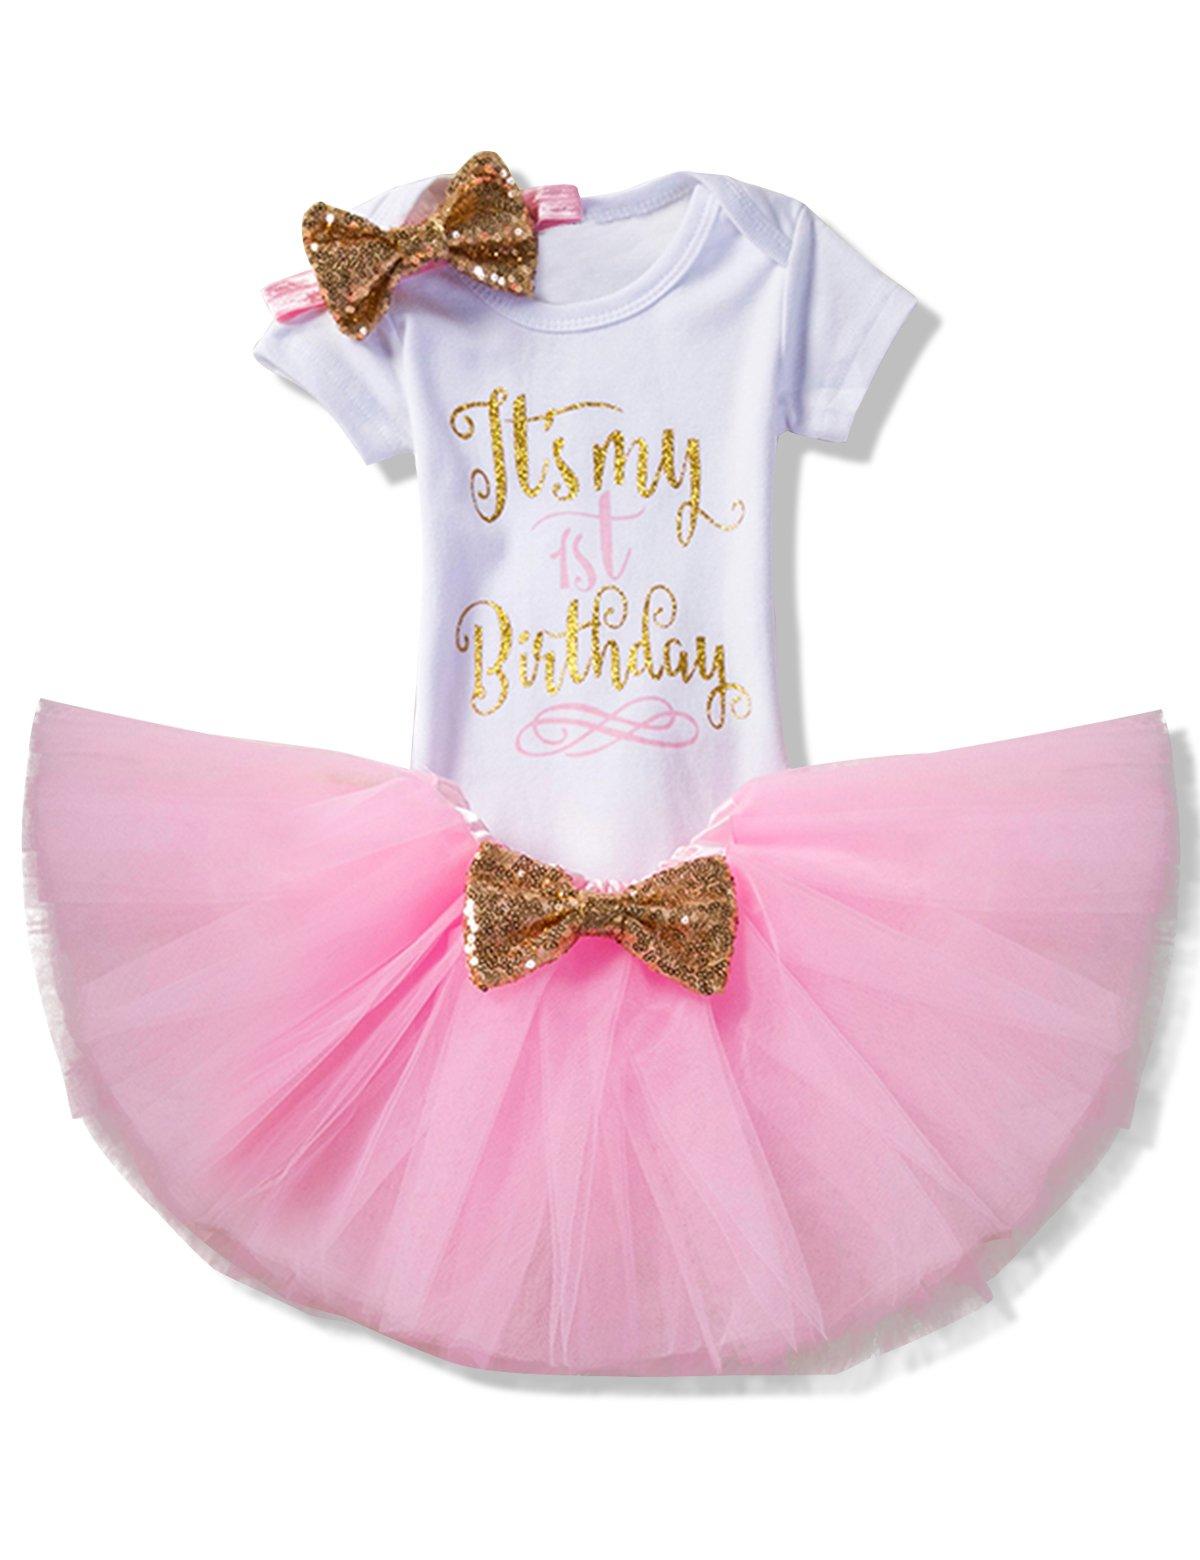 NNJXD-Girl-Newborn-Its-My-1st-Birthday-3-Pcs4-pcs-Outfits-RomperSkirtHeadbandLeggings